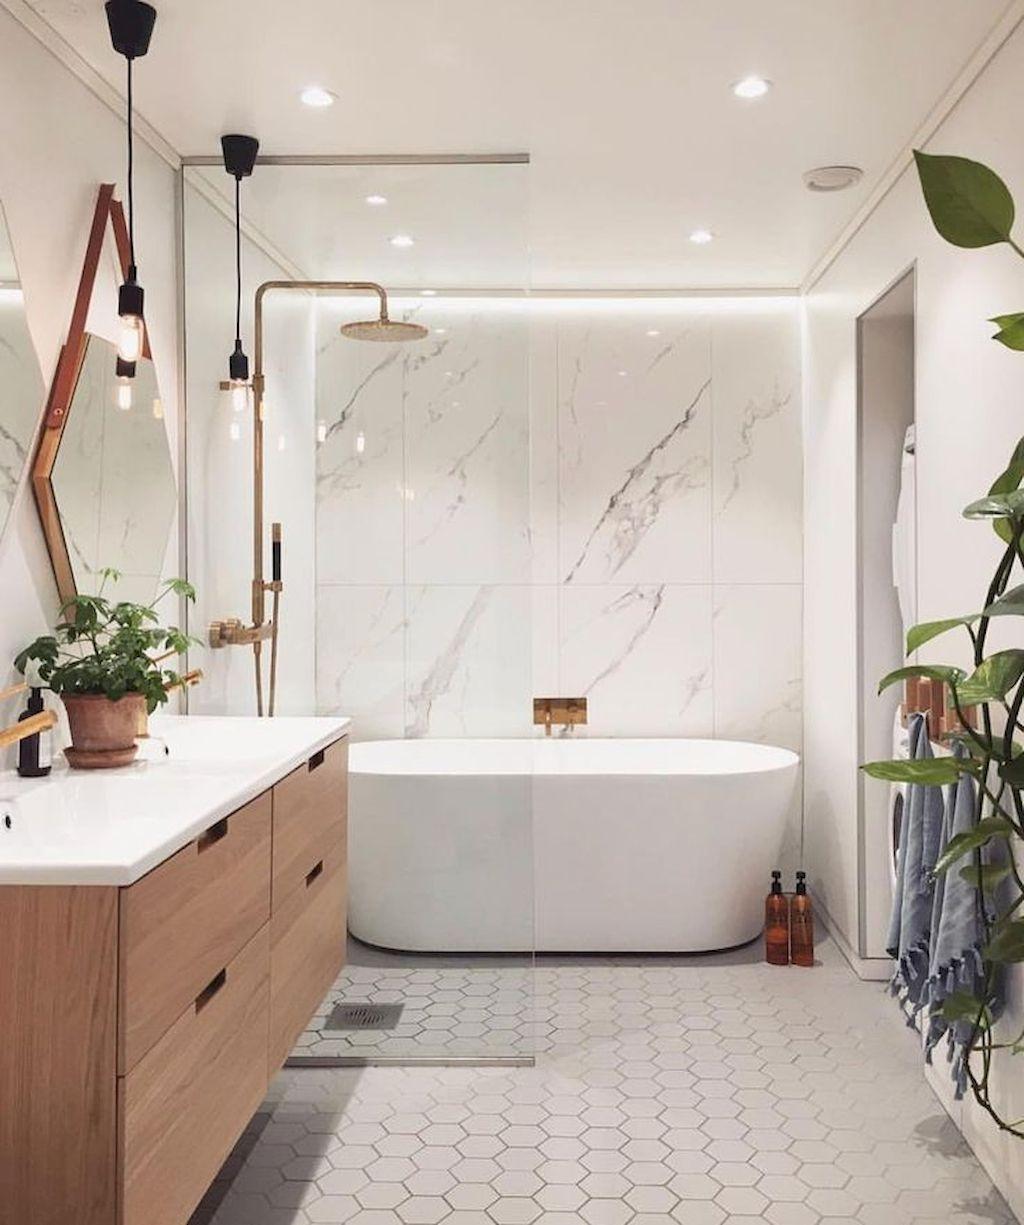 Exquisite Lavatory Renovation A Step By Step Information Diy Bathroom Remodel Bathroom Interior Design Unique Bathroom Mirrors